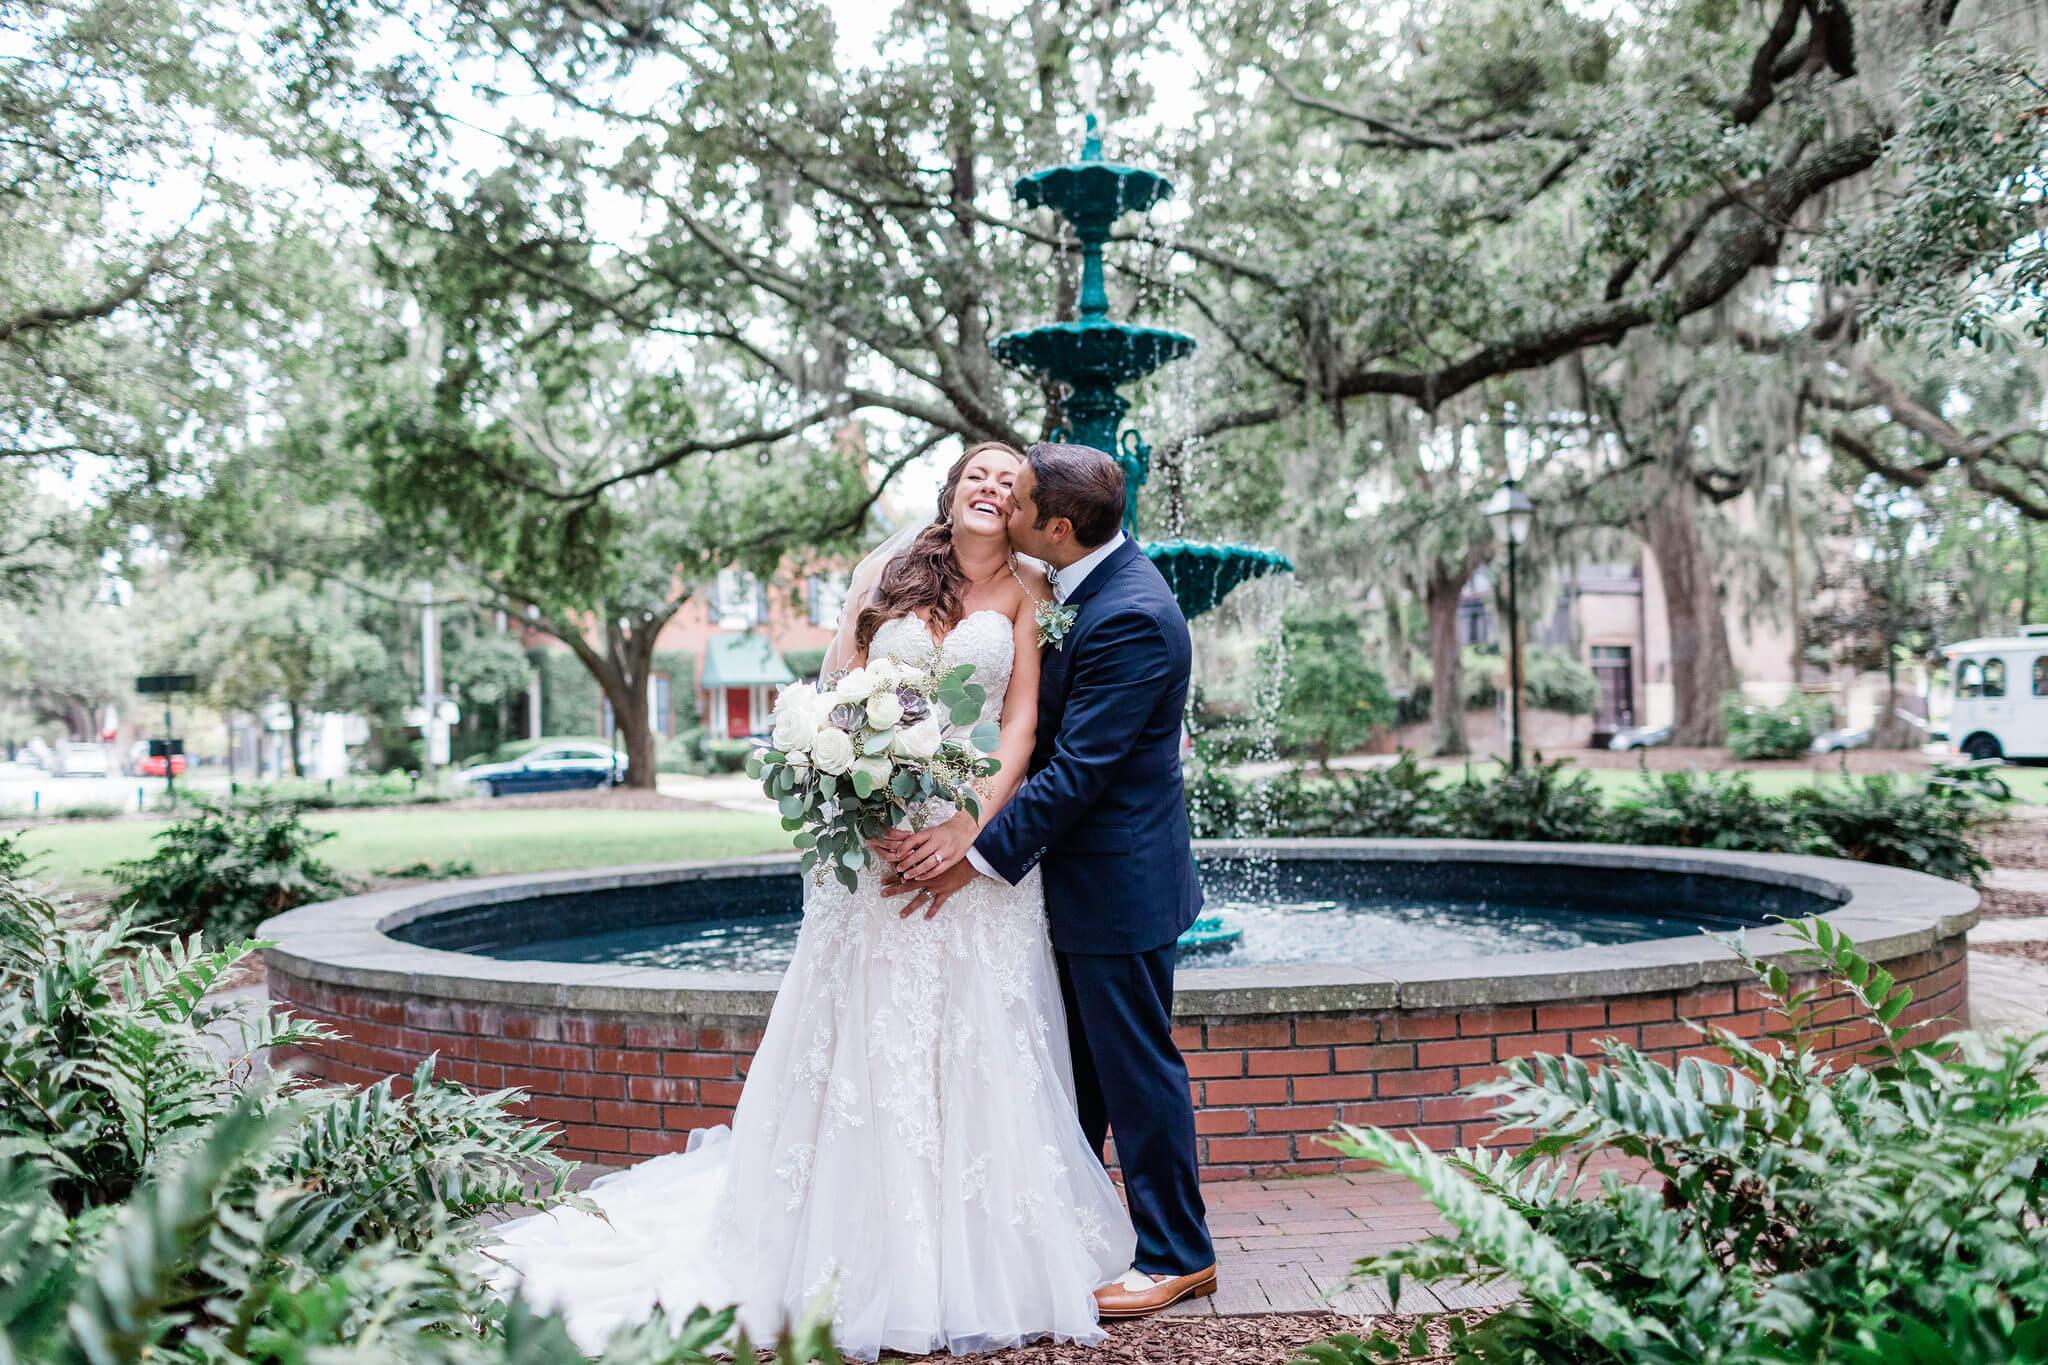 Apt-b-photography-savannah-wedding-photographer-savannah-wedding-historic-downtown-wedding-photographer-10.jpg